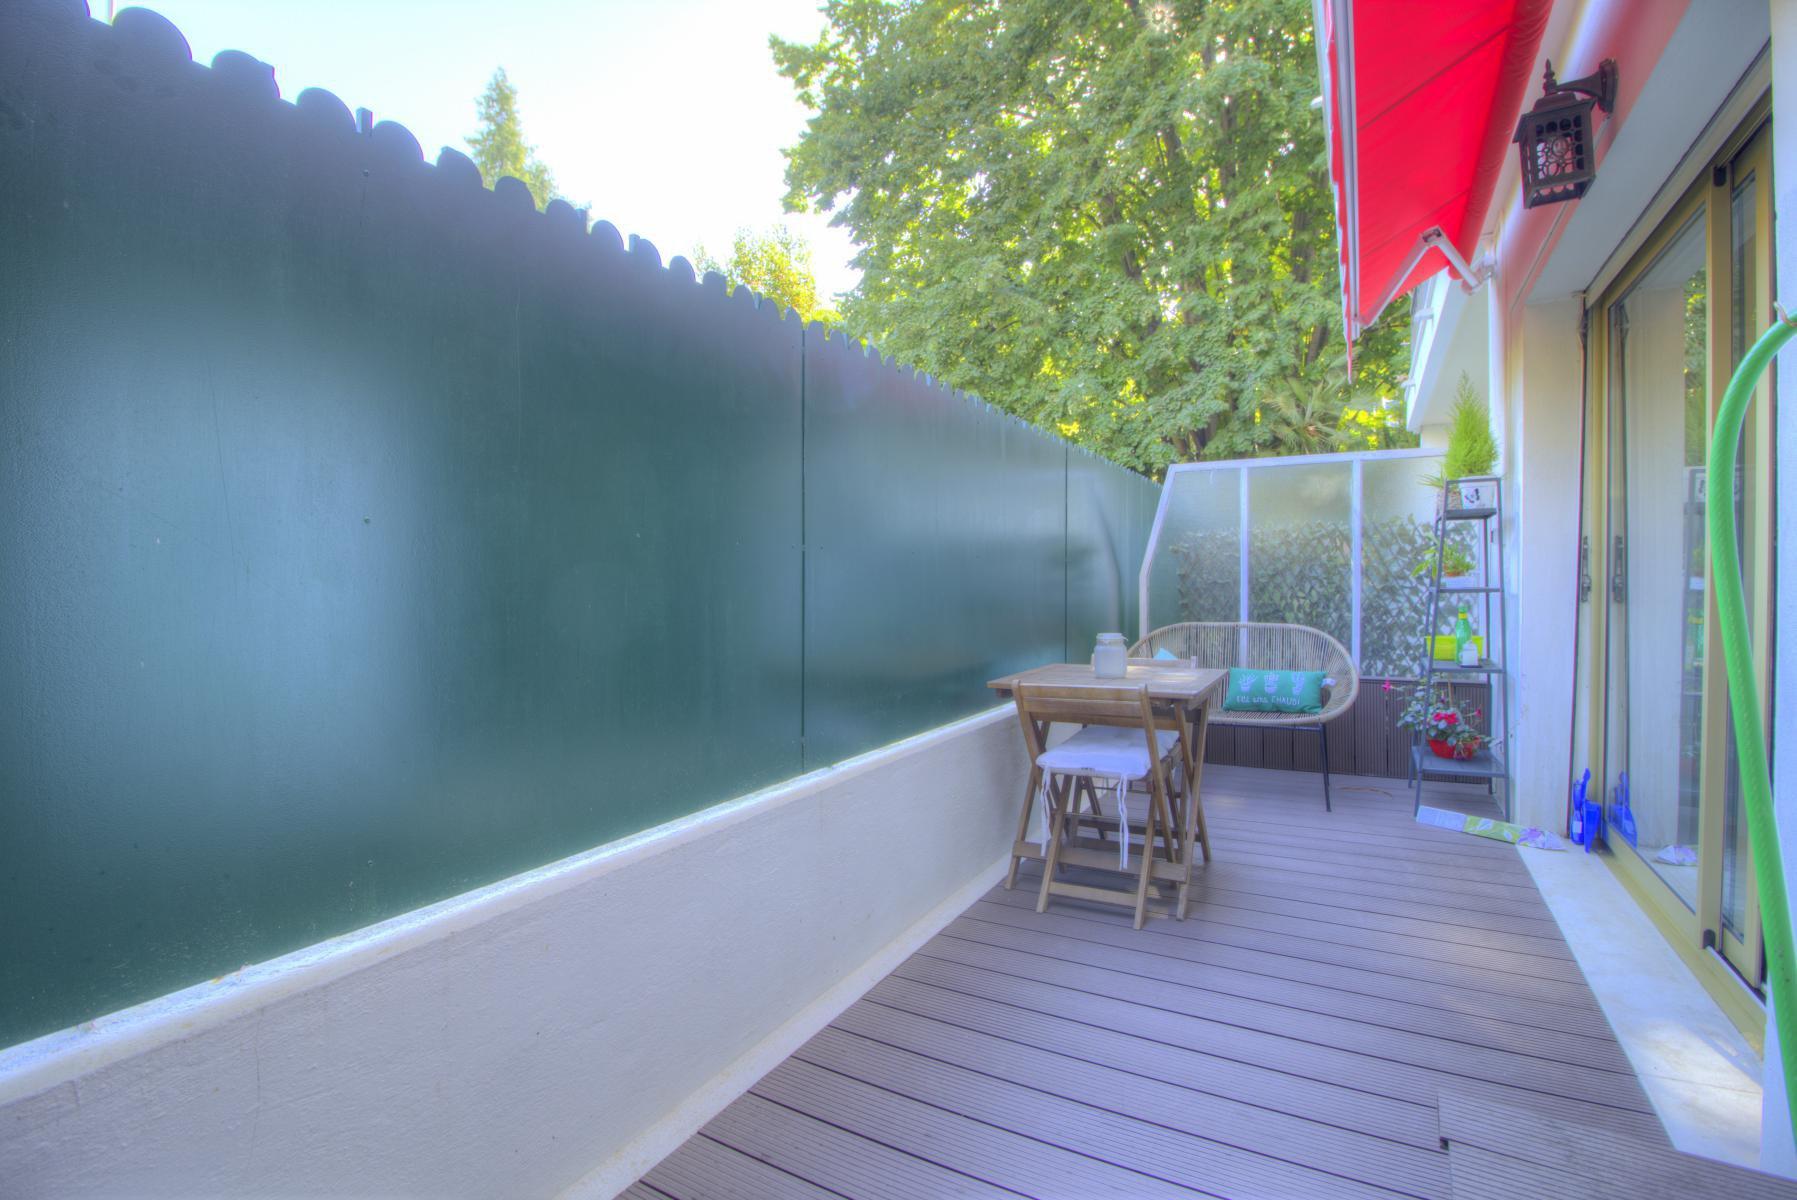 Studio Terrasse à louer, Nice, Chambrun